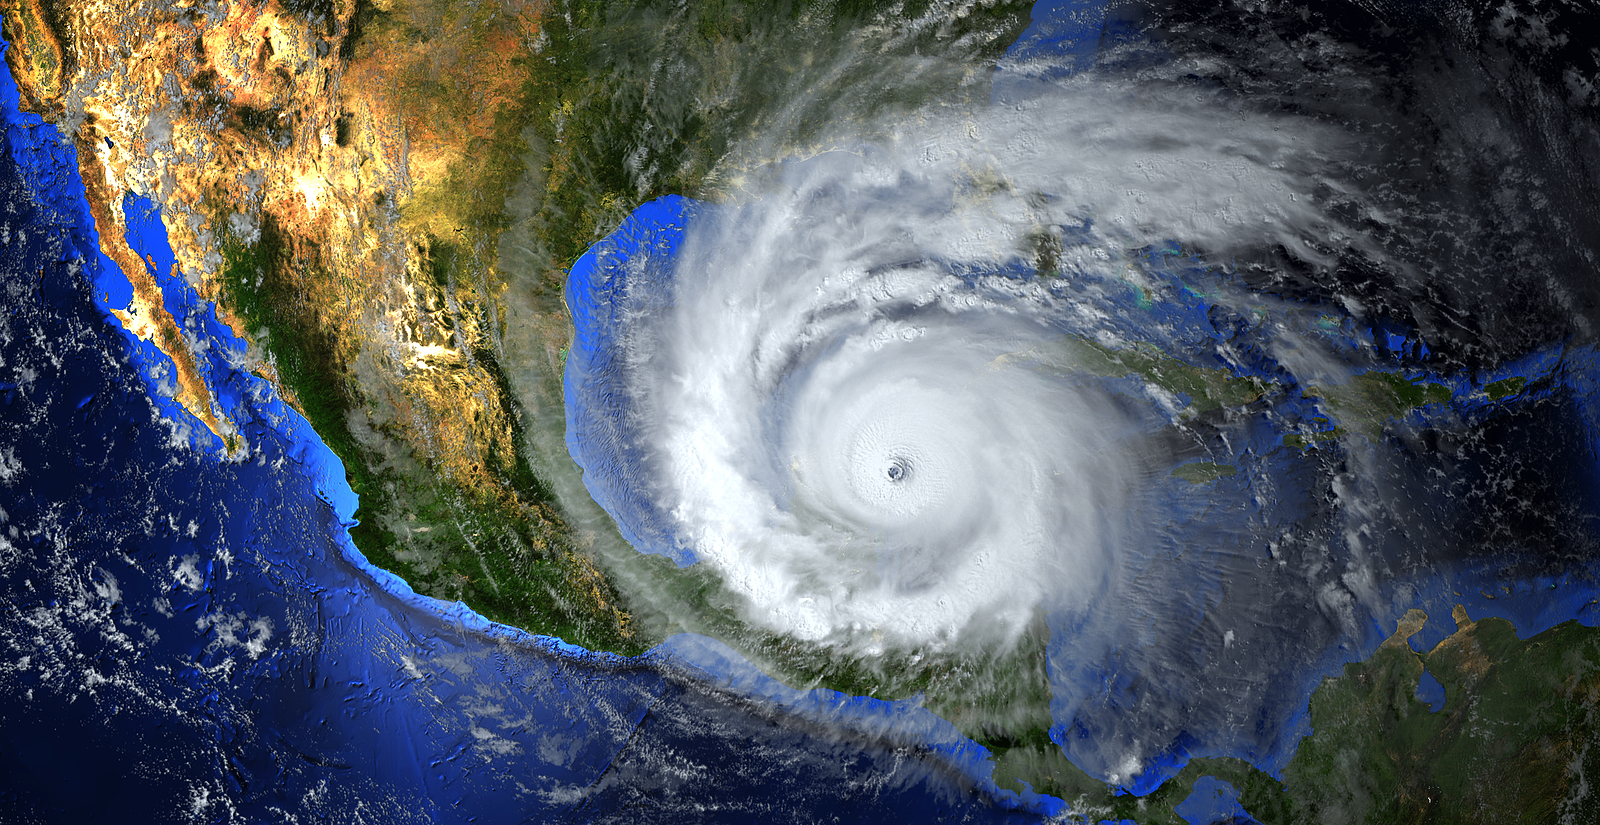 bigstock-Hurricane-Approaching-The-Amer-286634335